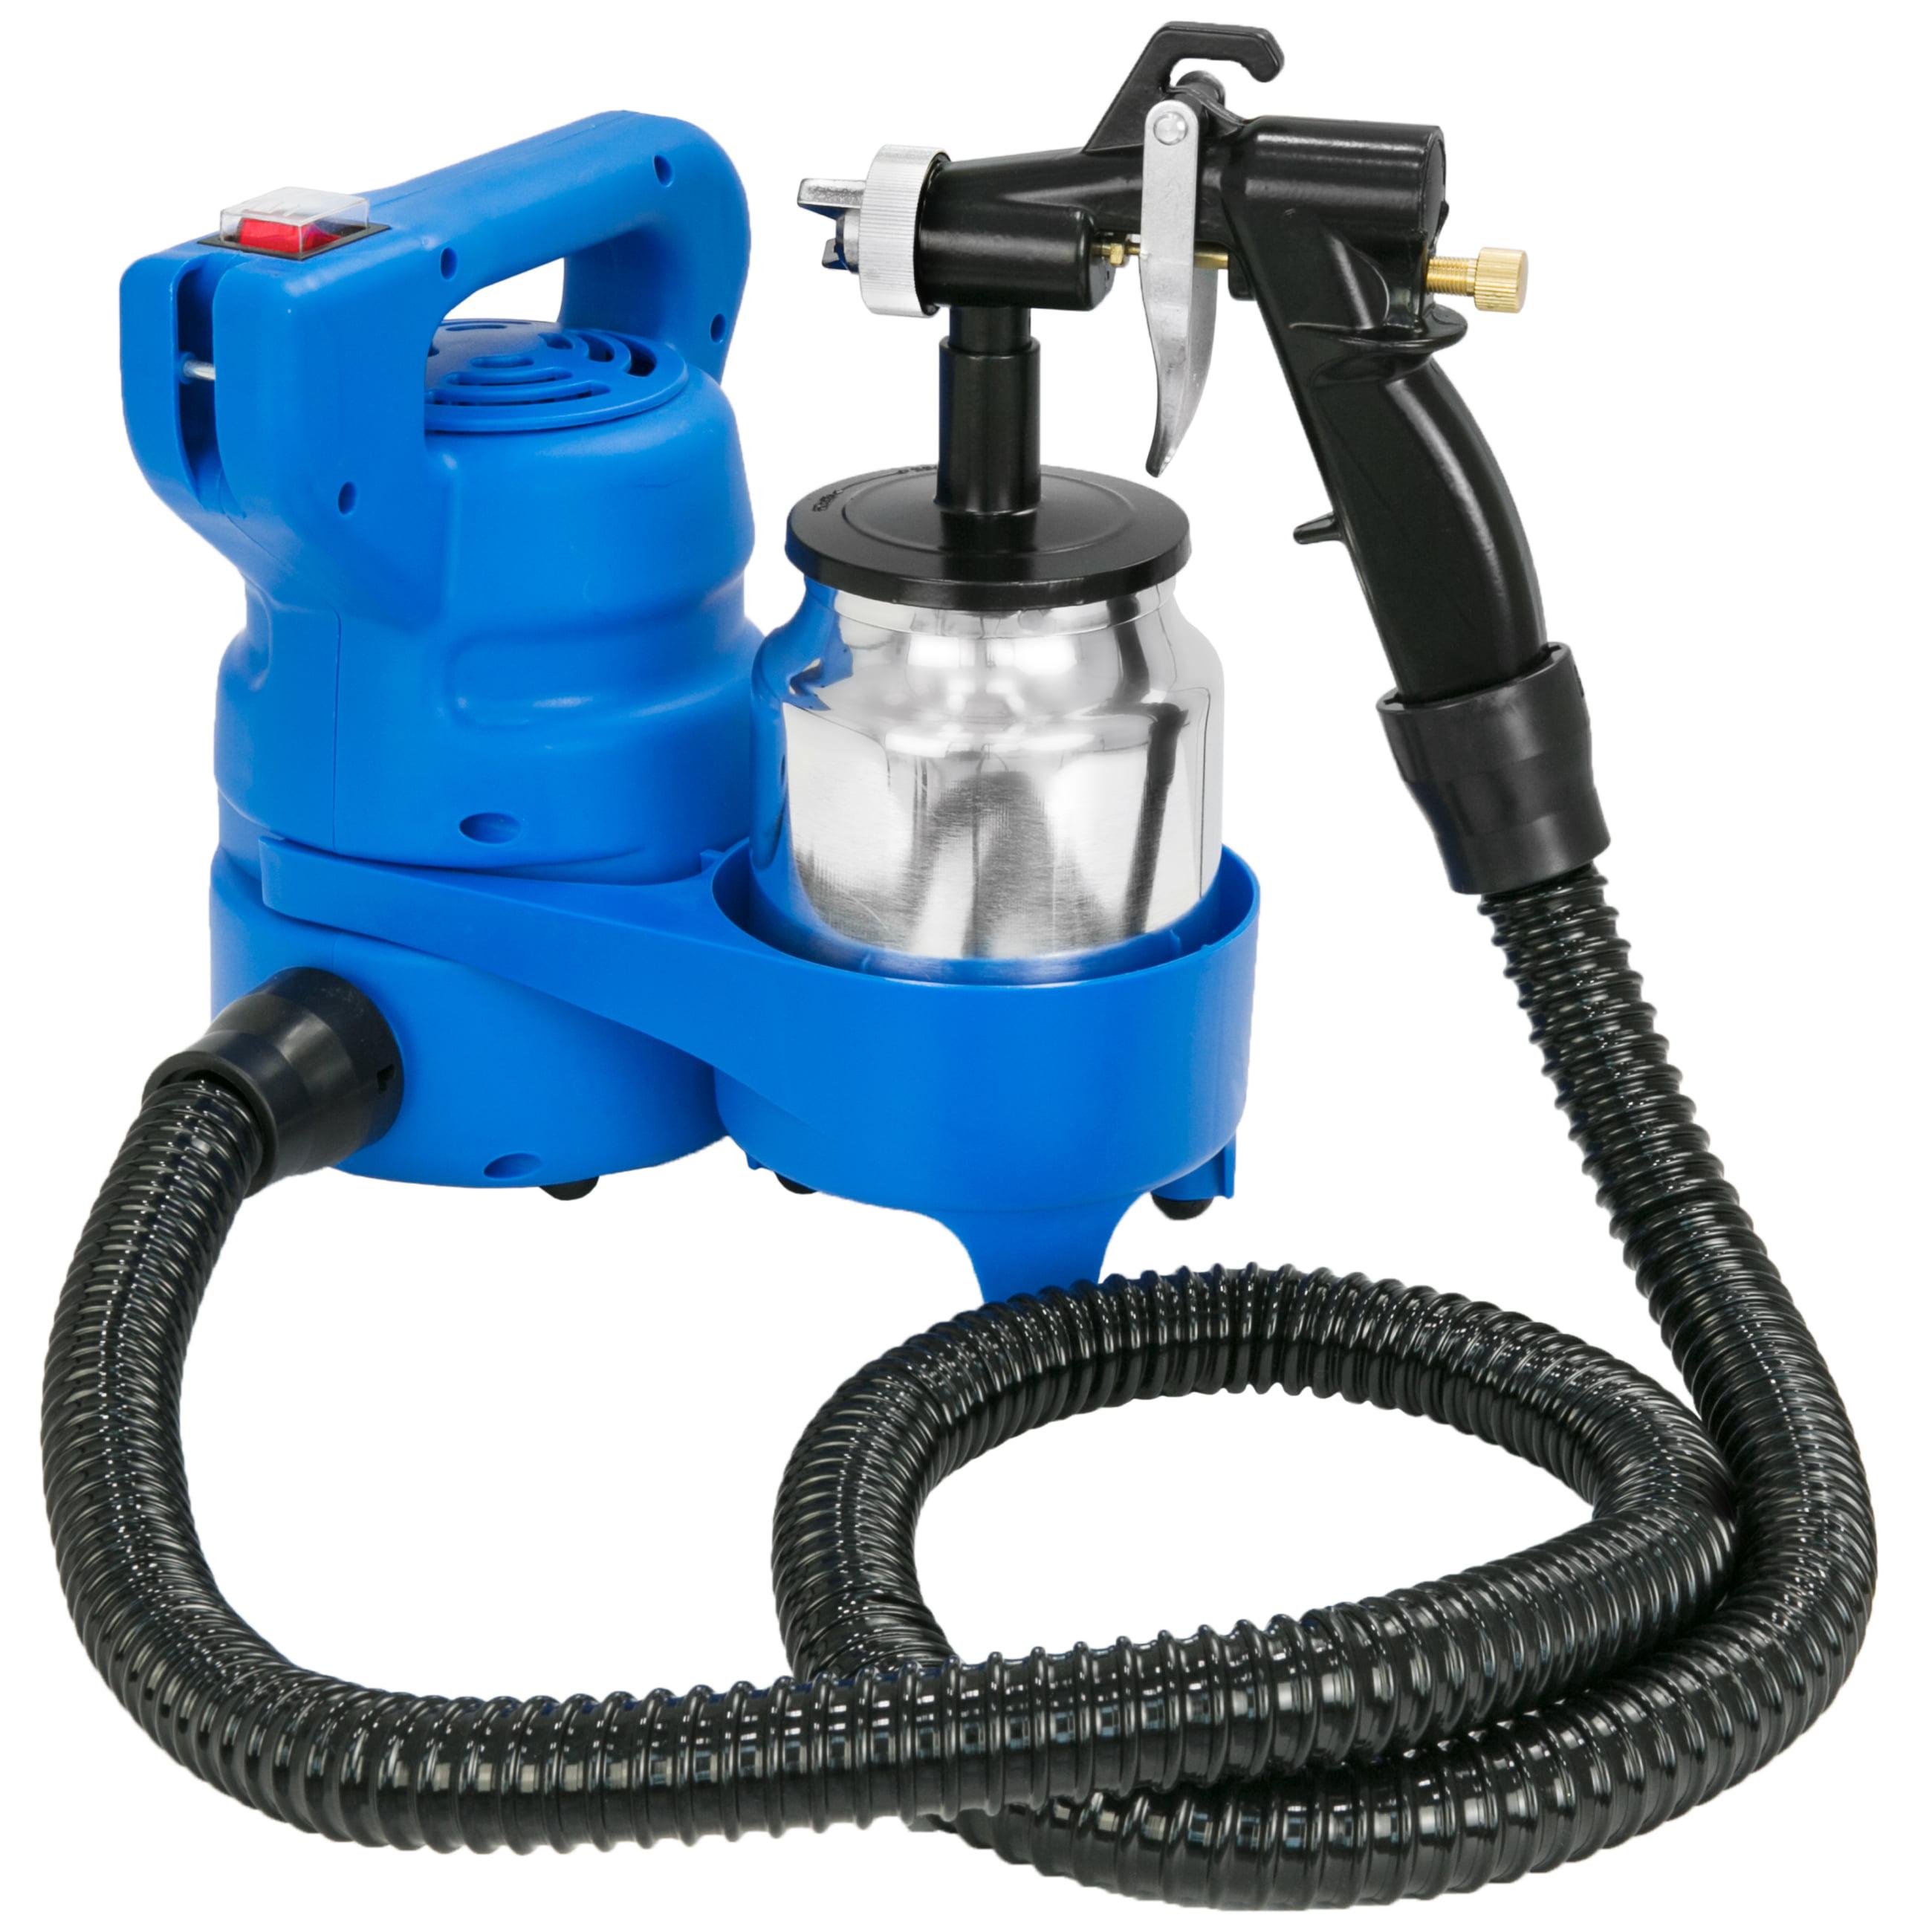 Best Choice Products Detachable 650W Electric Paint Spray Gun w/ 3 Spray Settings, Shoulder Strap, No-Drip Copper Nozzle